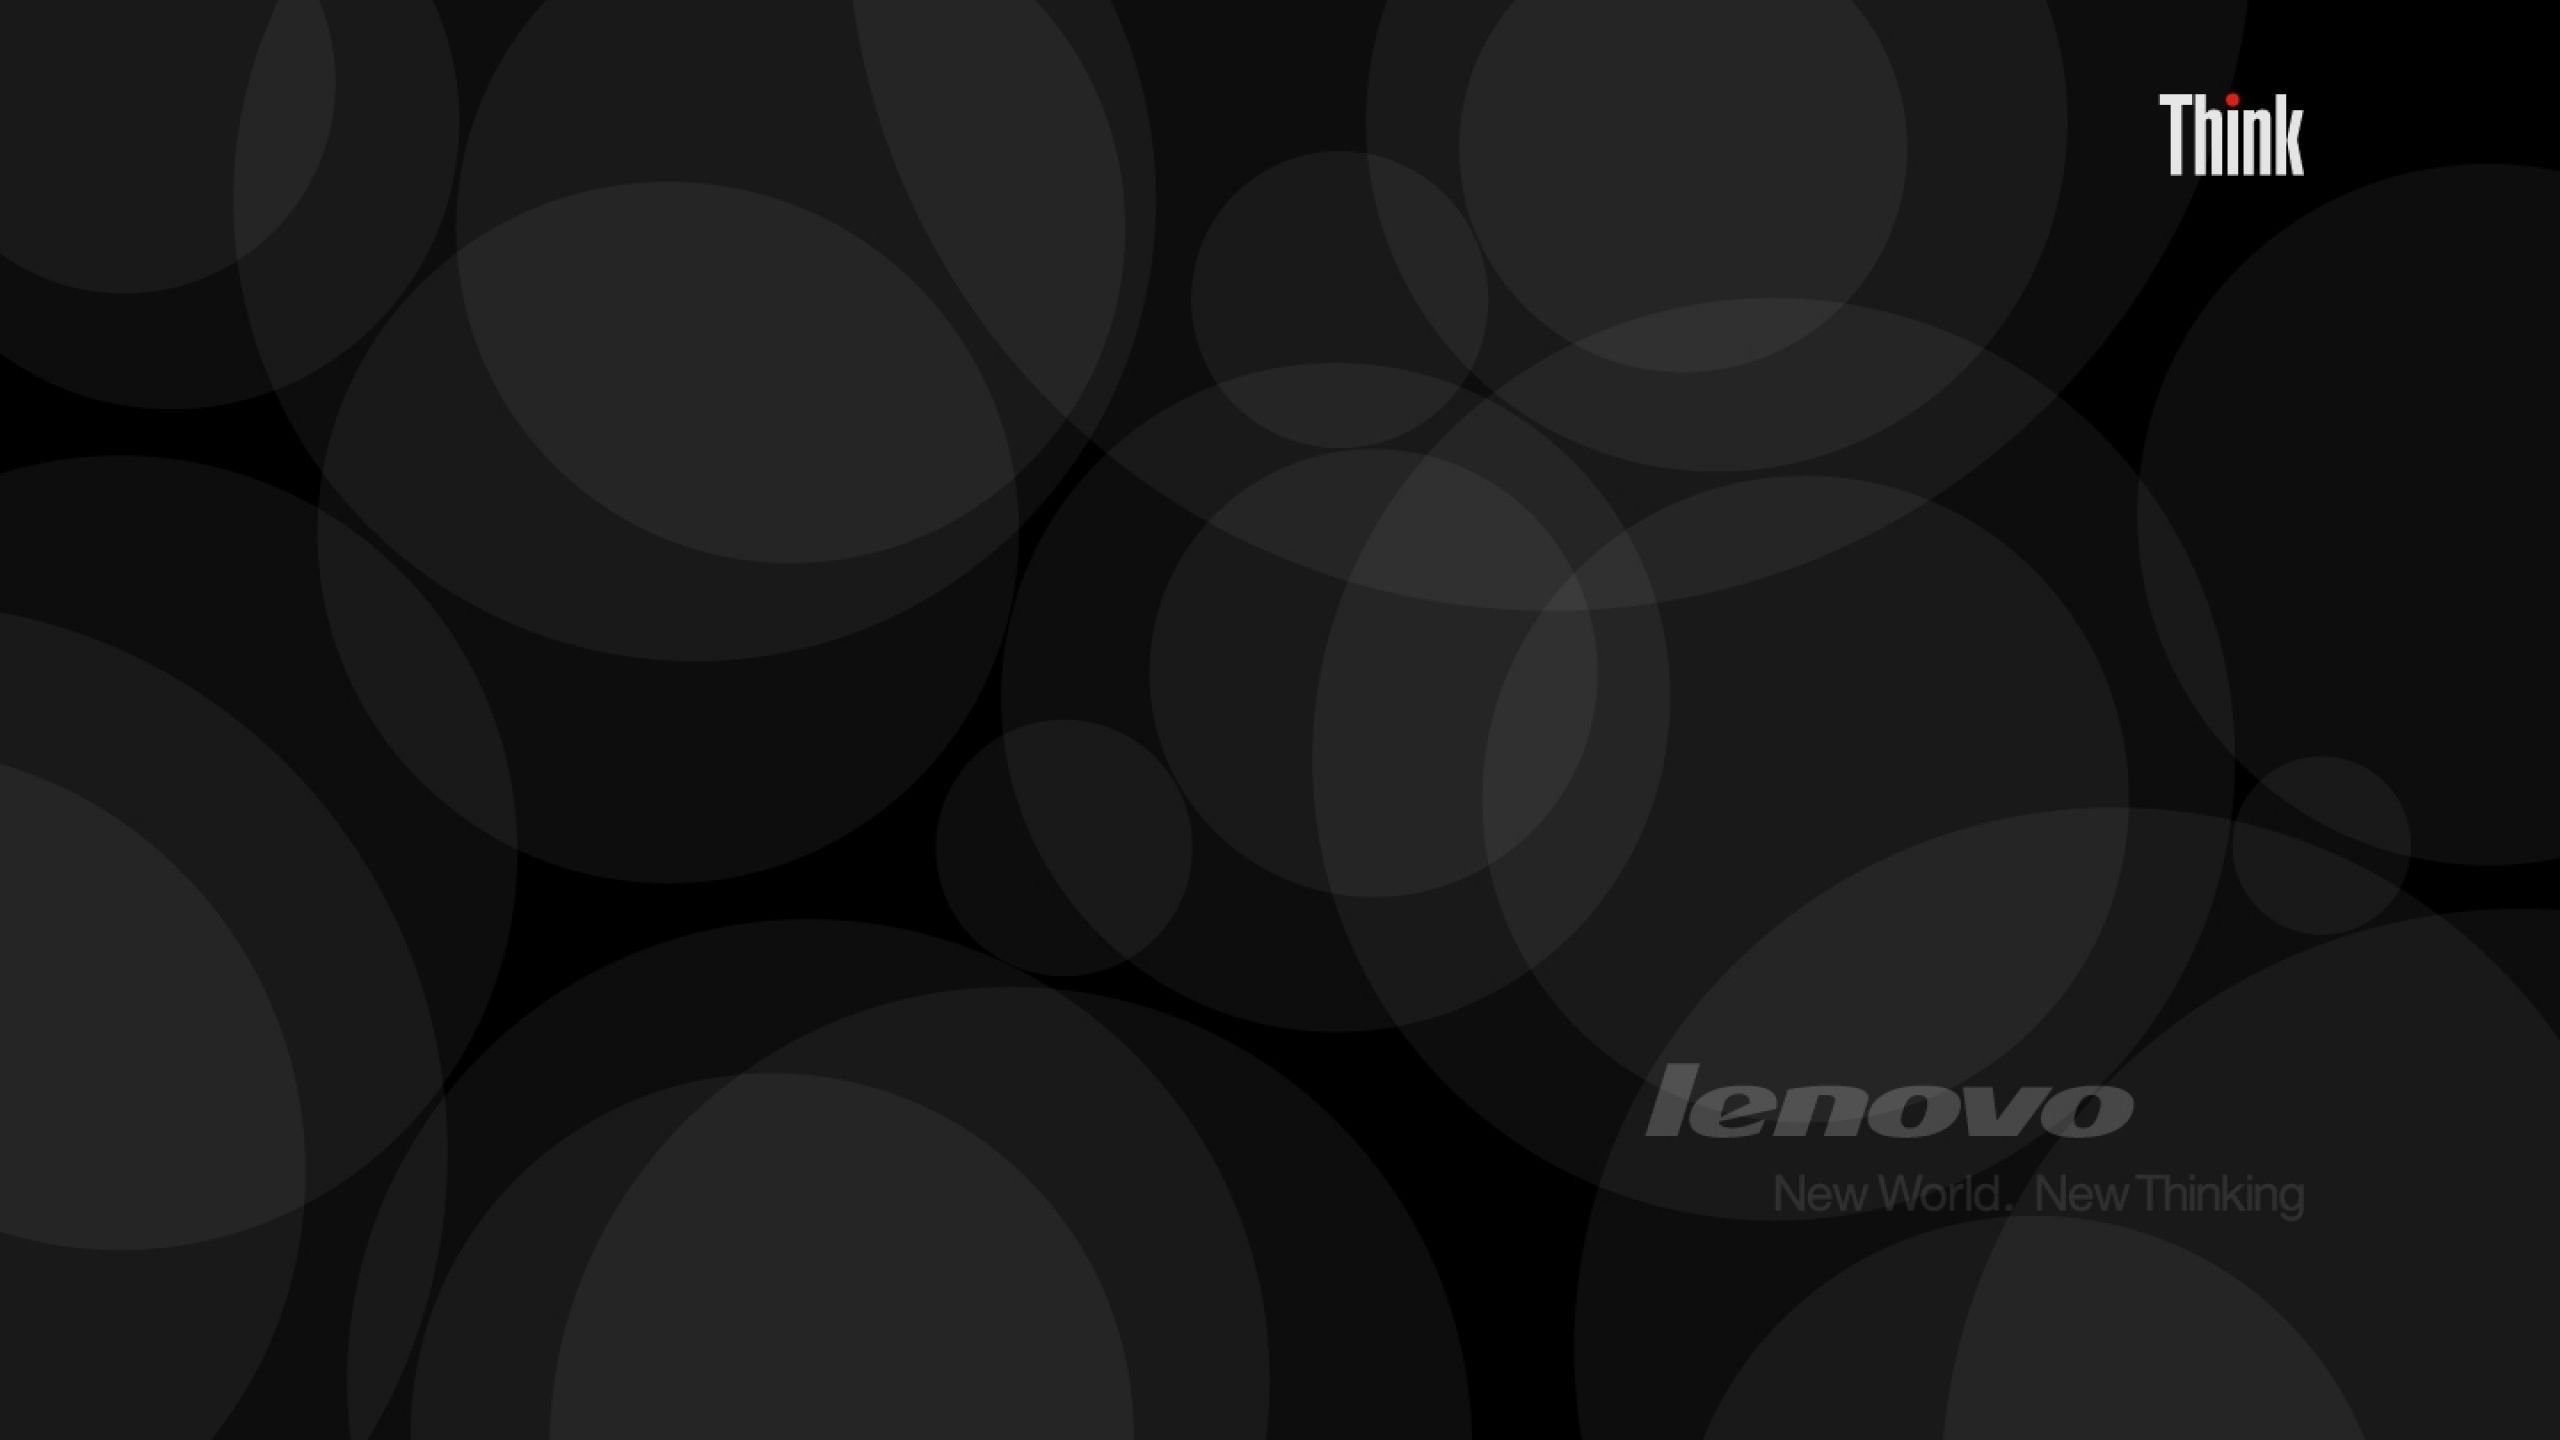 Lenovo Yoga Wallpapers Top Free Lenovo Yoga Backgrounds Wallpaperaccess